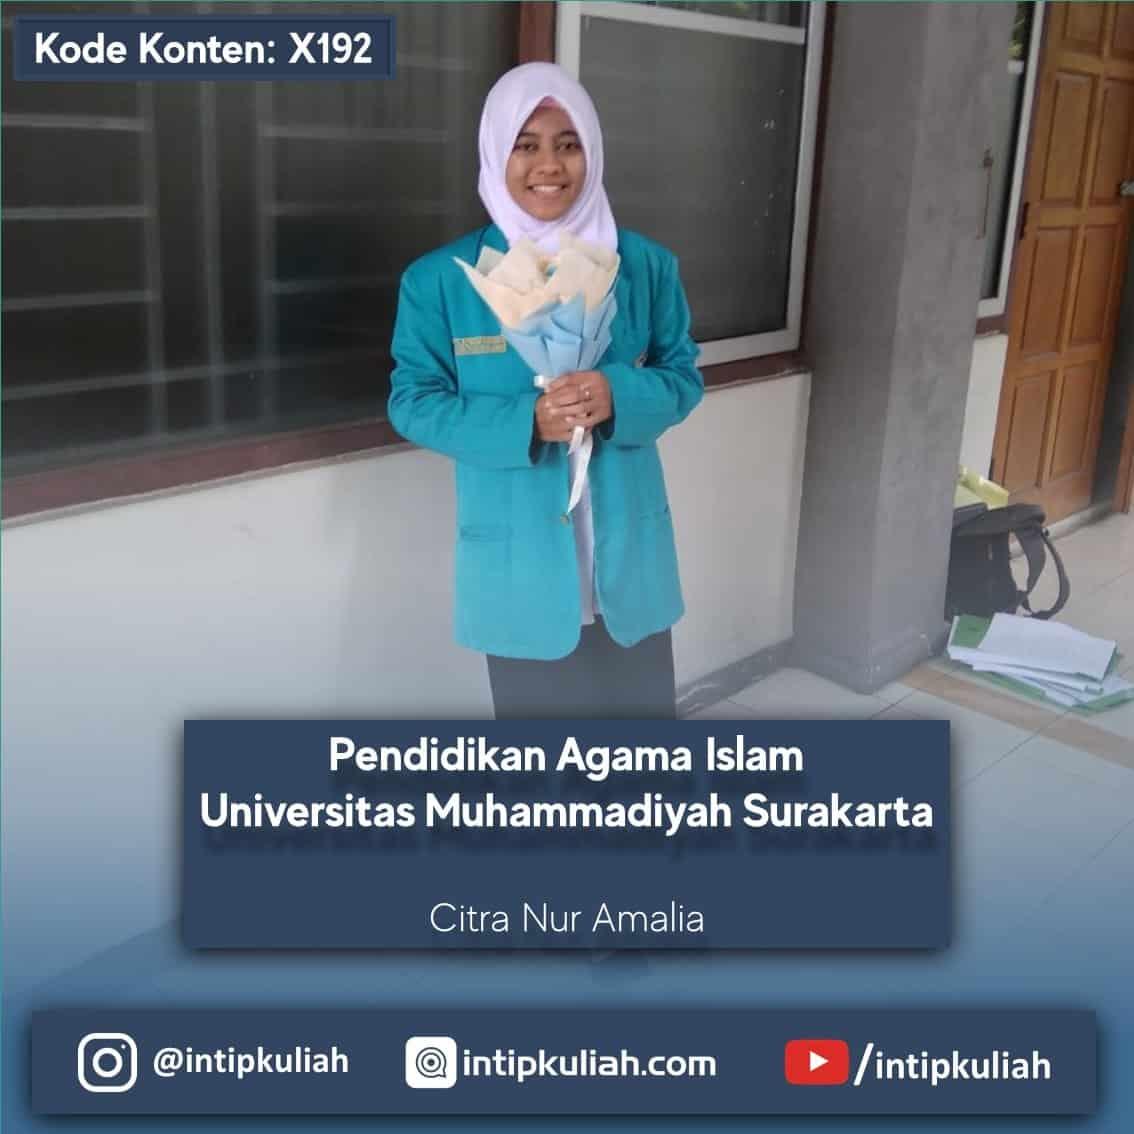 Pendidikan Agama Islam / PAI UMS (Citra)